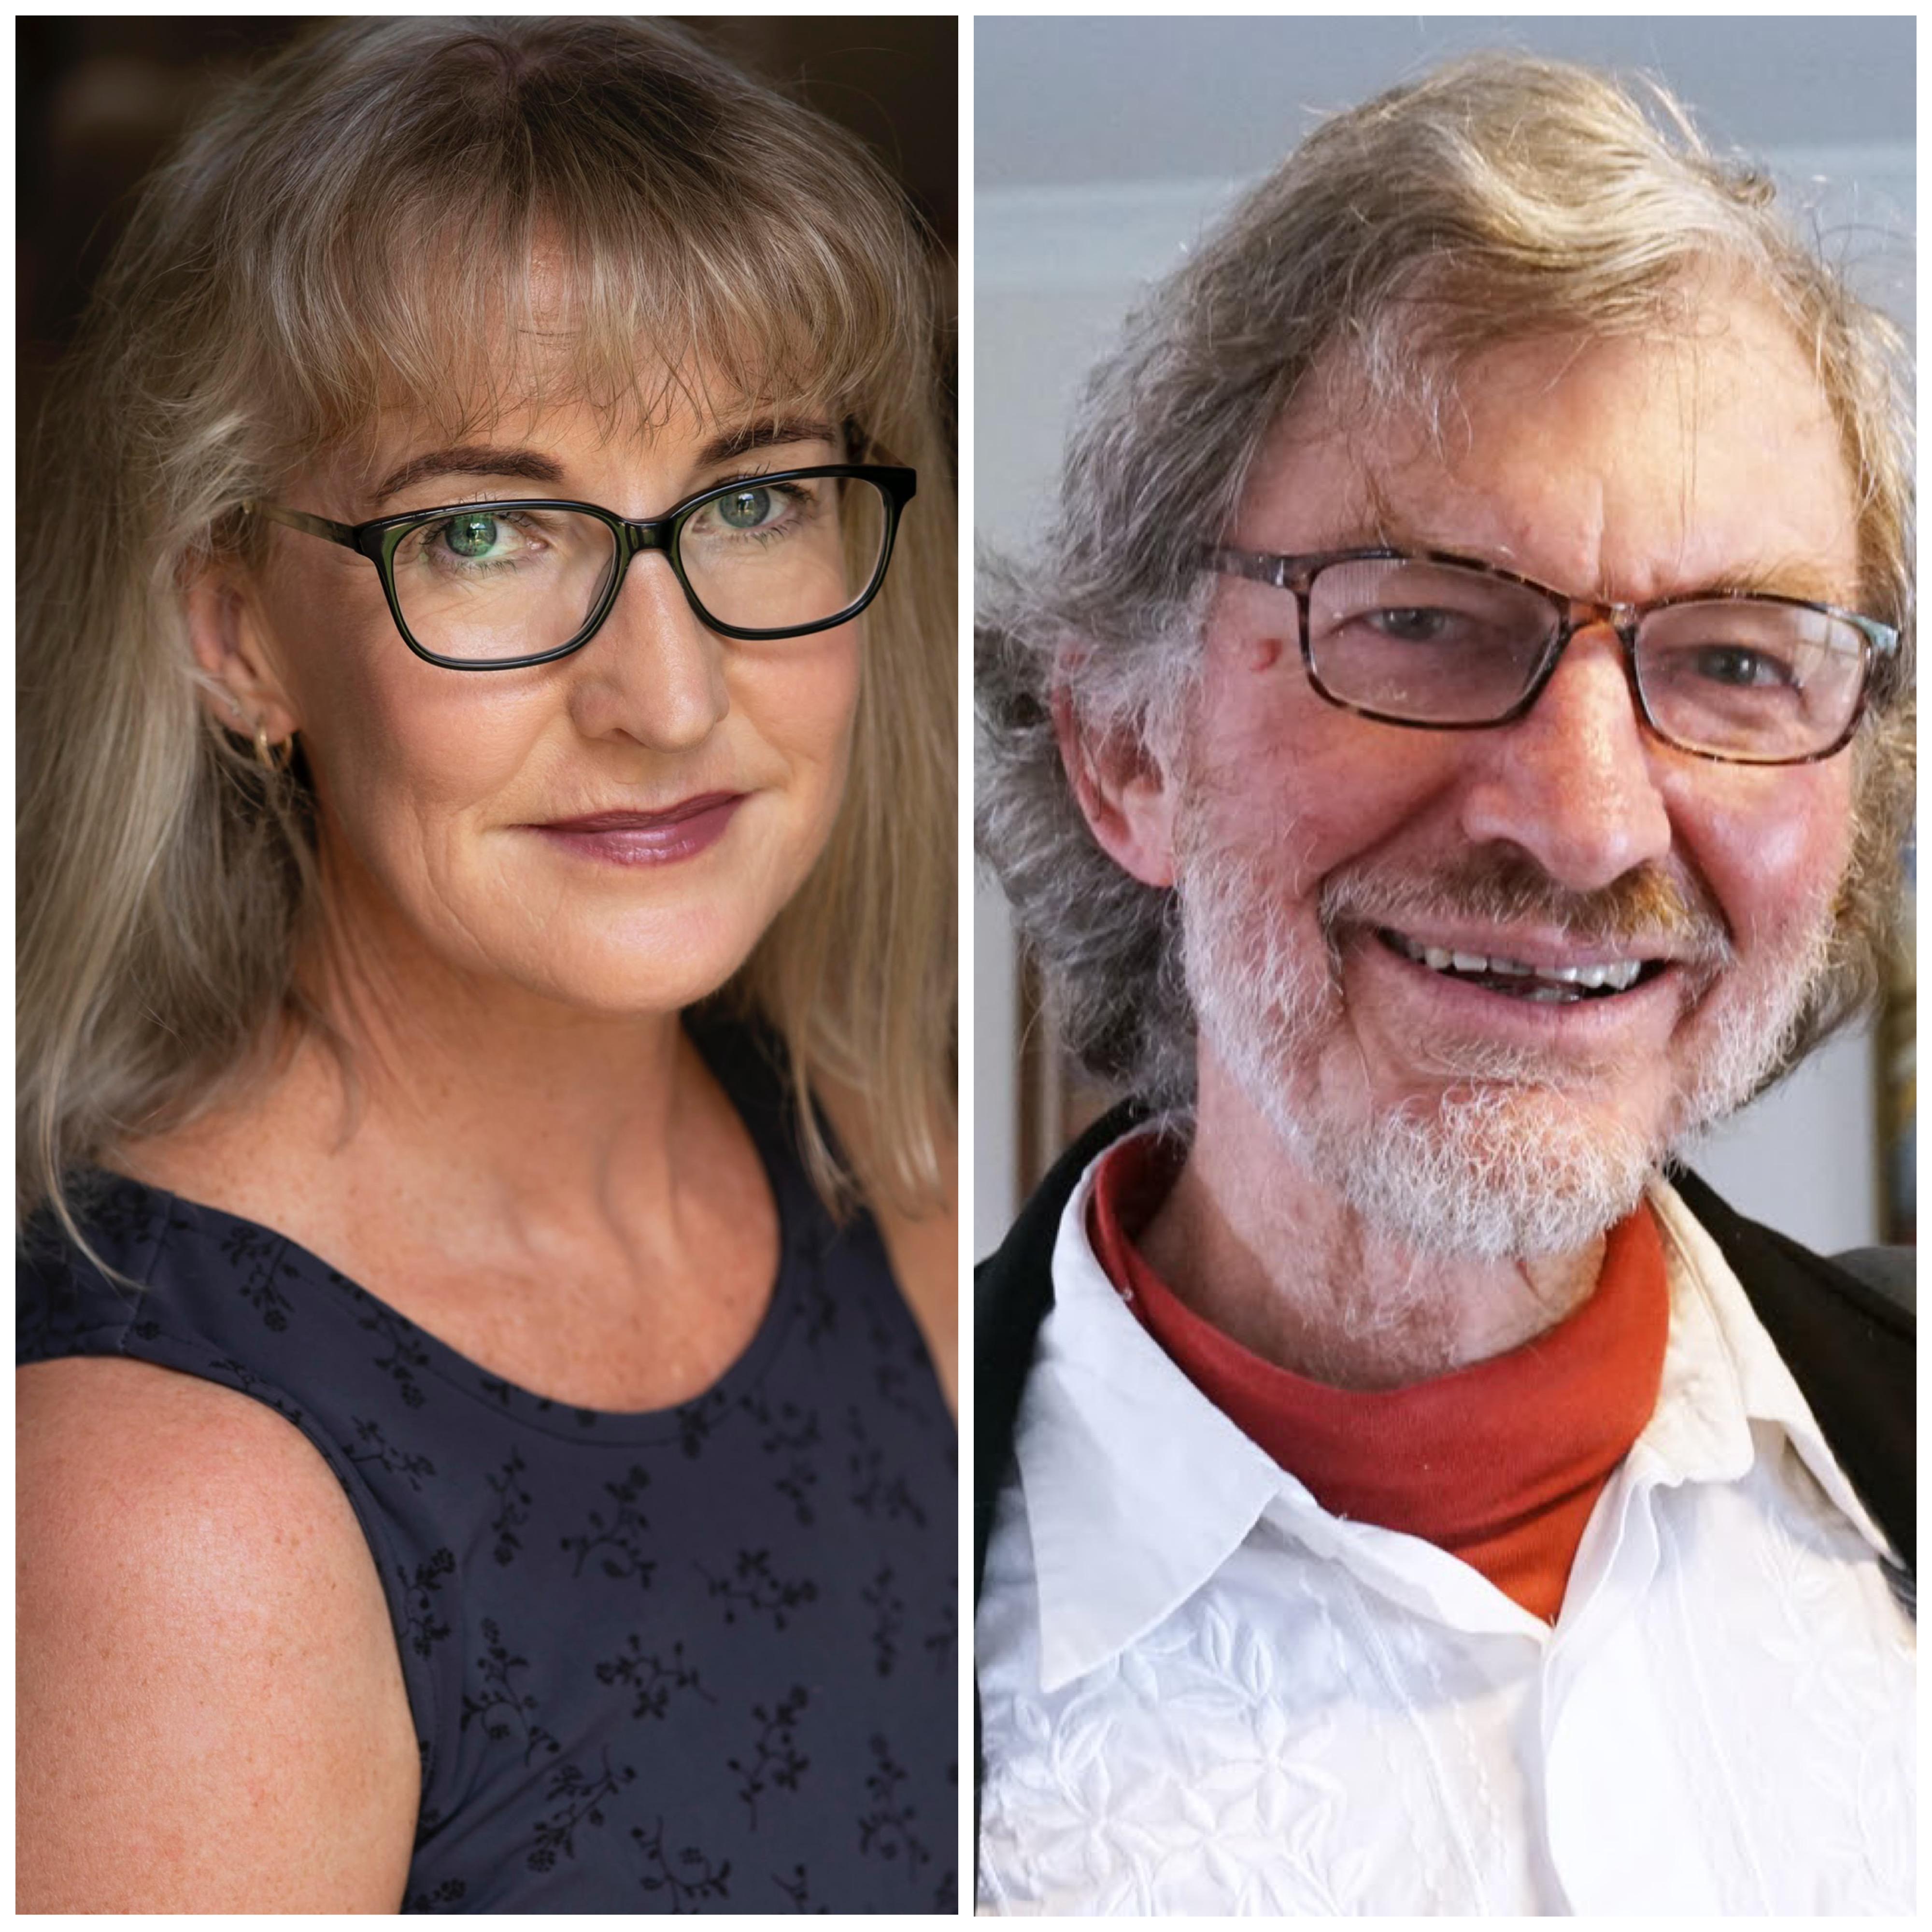 Dr Joanna Prendergast & Dr John Barton